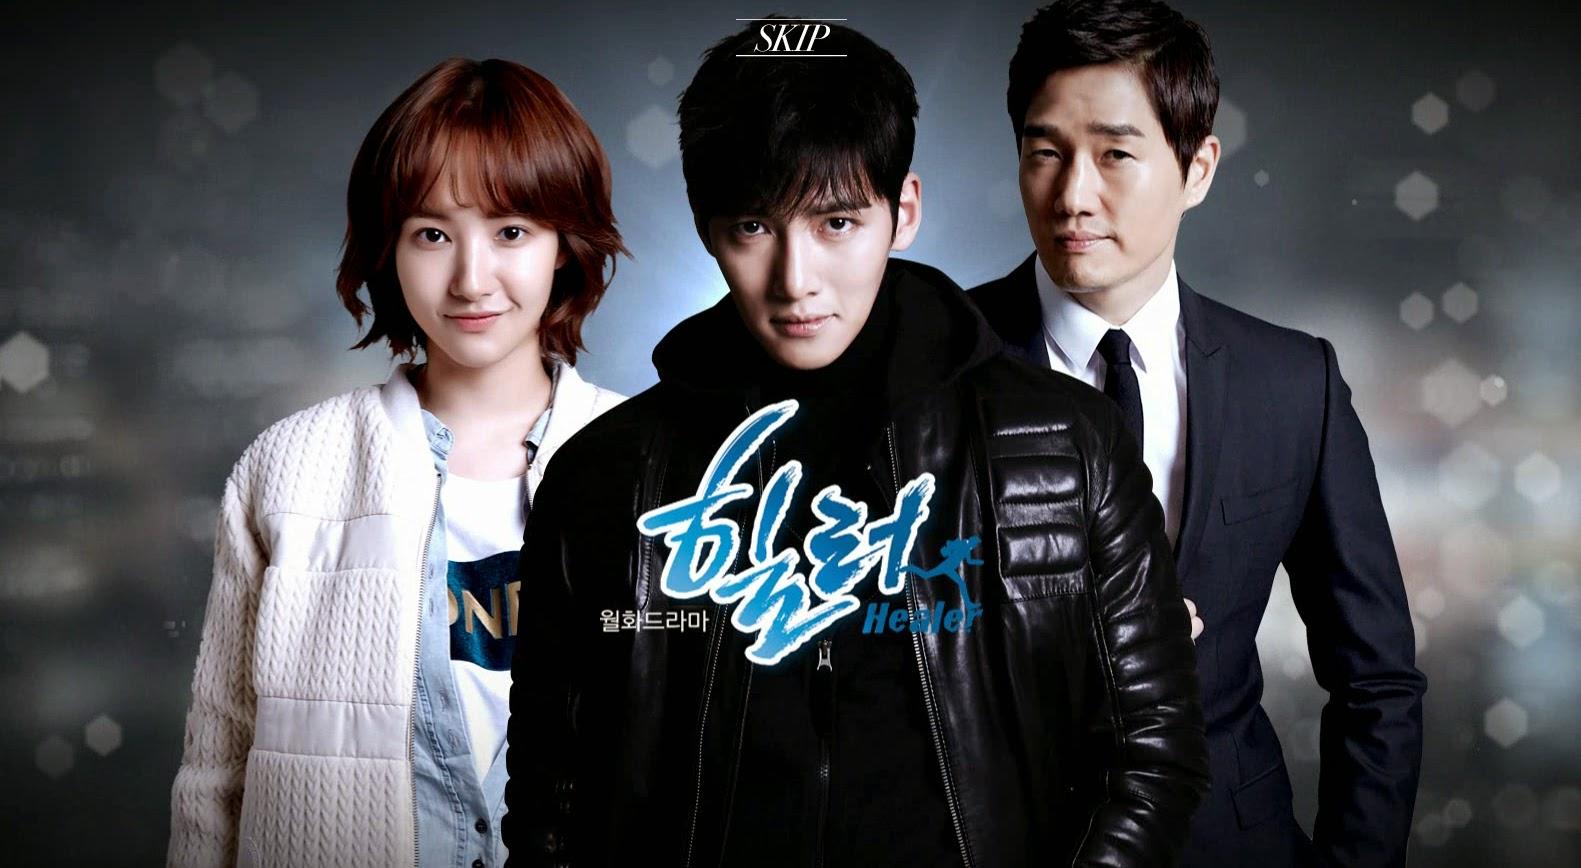 Drama Korea Healer Episode 1-20(END) Subtitle Indonesia